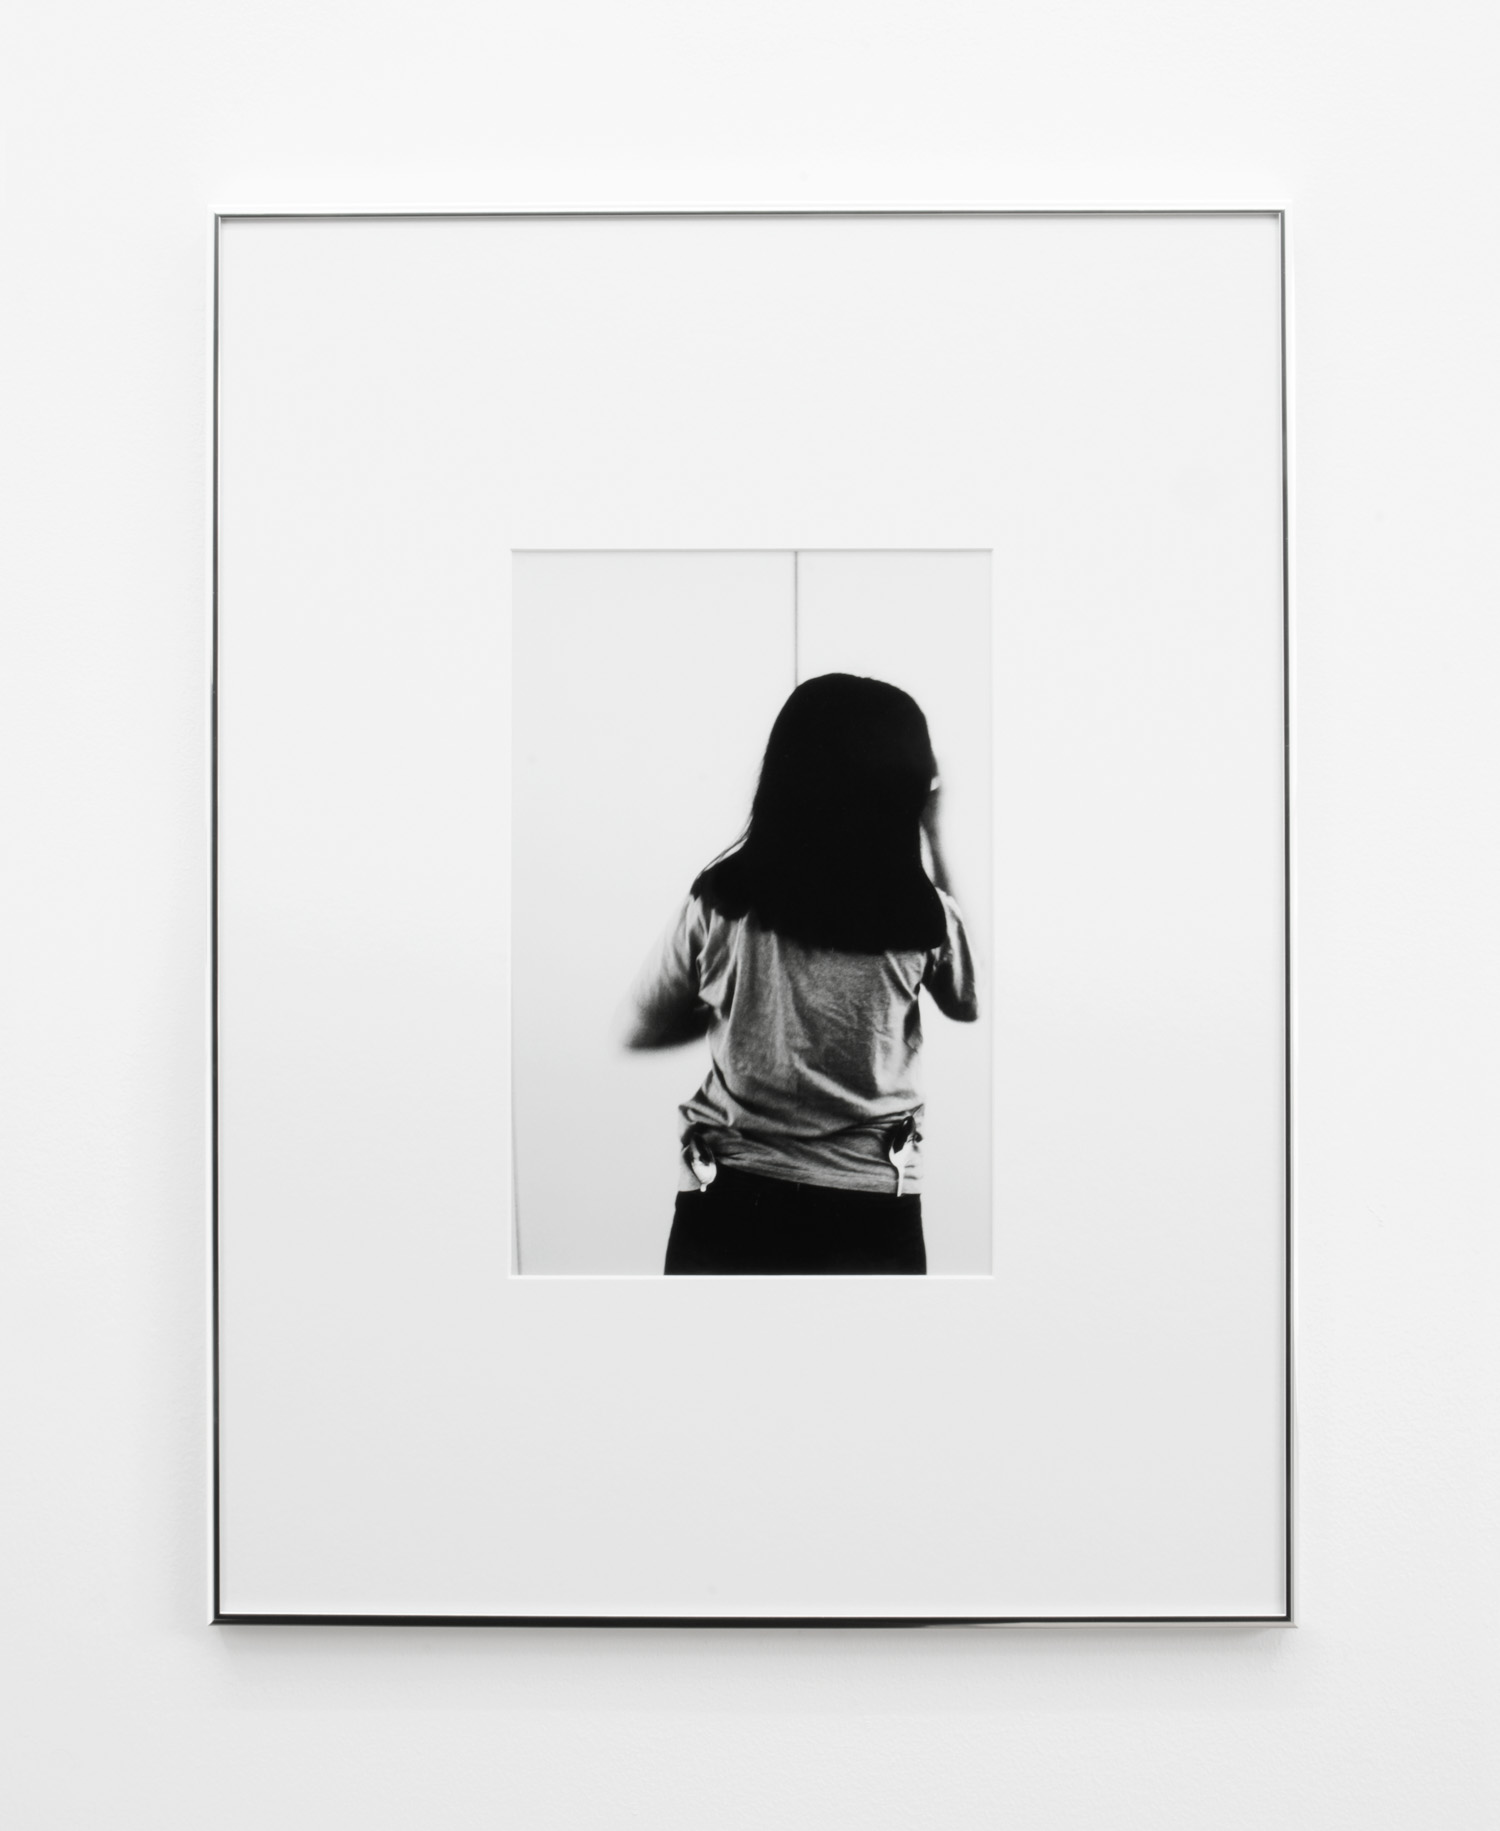 Leda 3 , 2015, 55 x 42cm (framed), Silver Gelatin print.